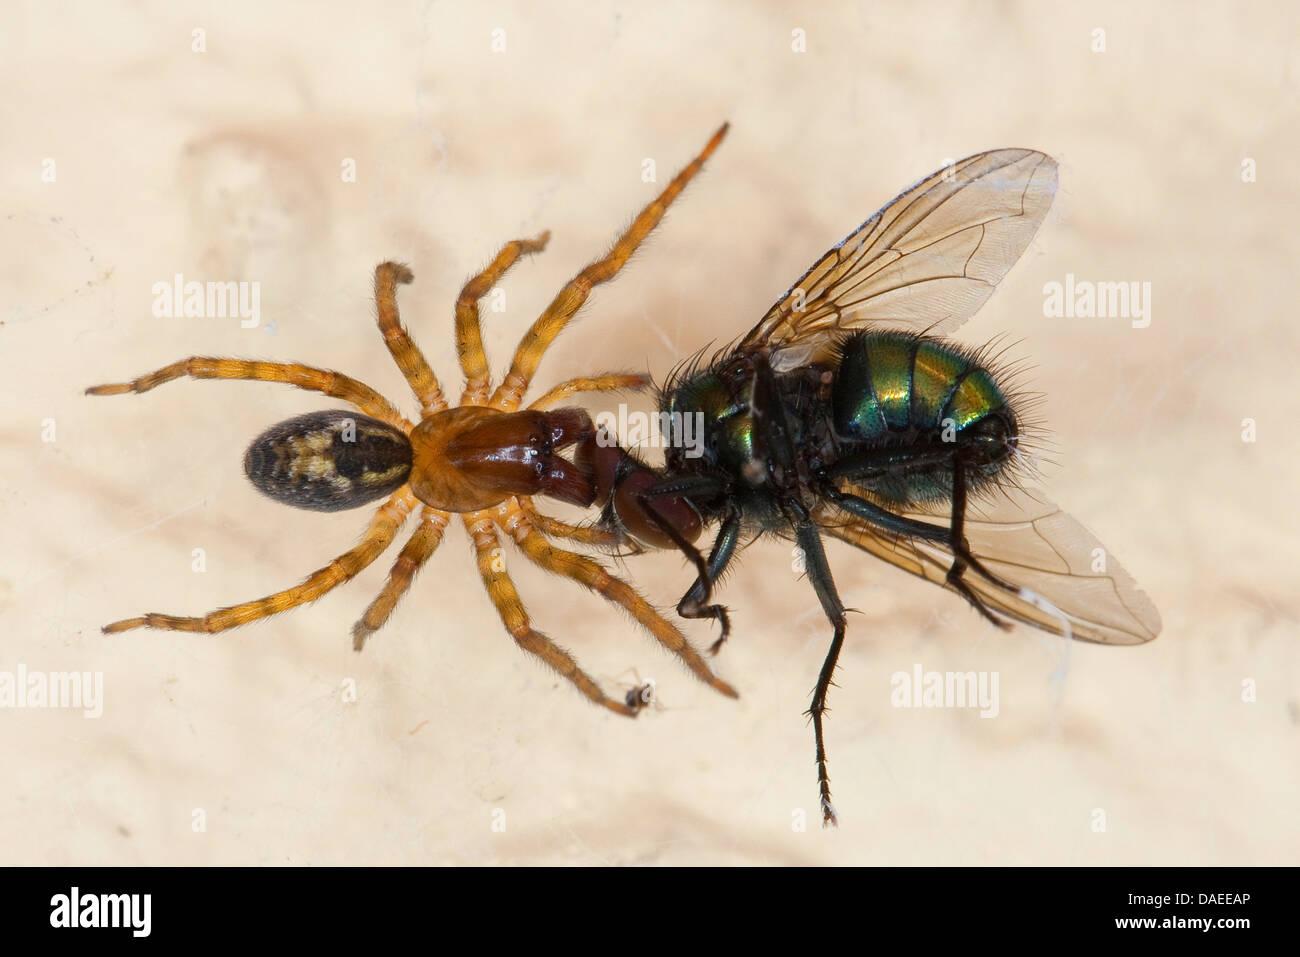 window lace weaver (Amaurobius fenestralis oder Amaurobius similis), female with caught green bottle fly, Germany - Stock Image